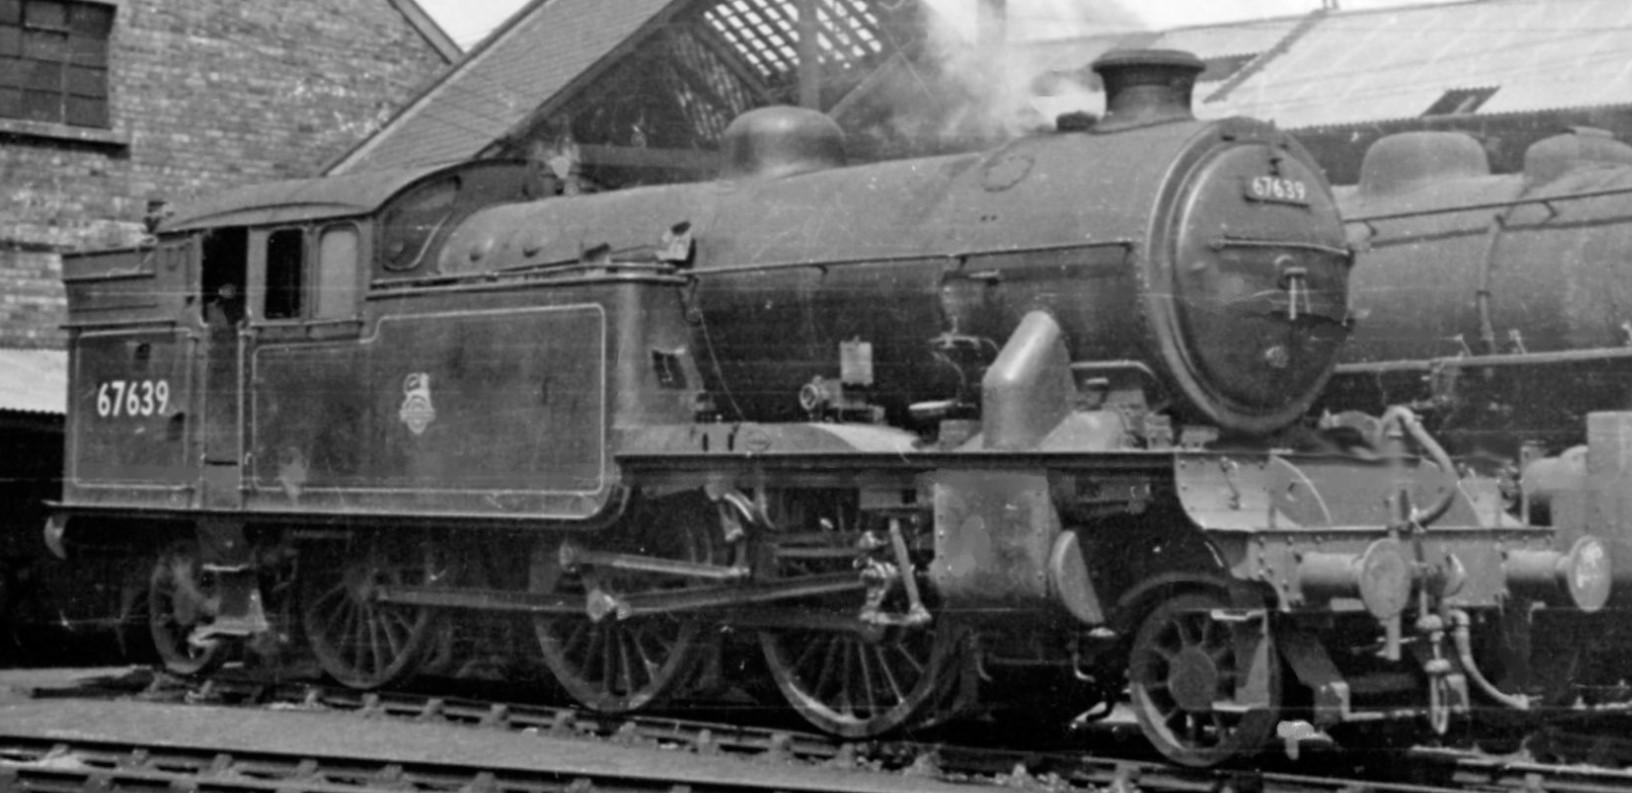 67639 at Middlesborough Locomotive Depot in June 1954. ©Ben Brooksbank